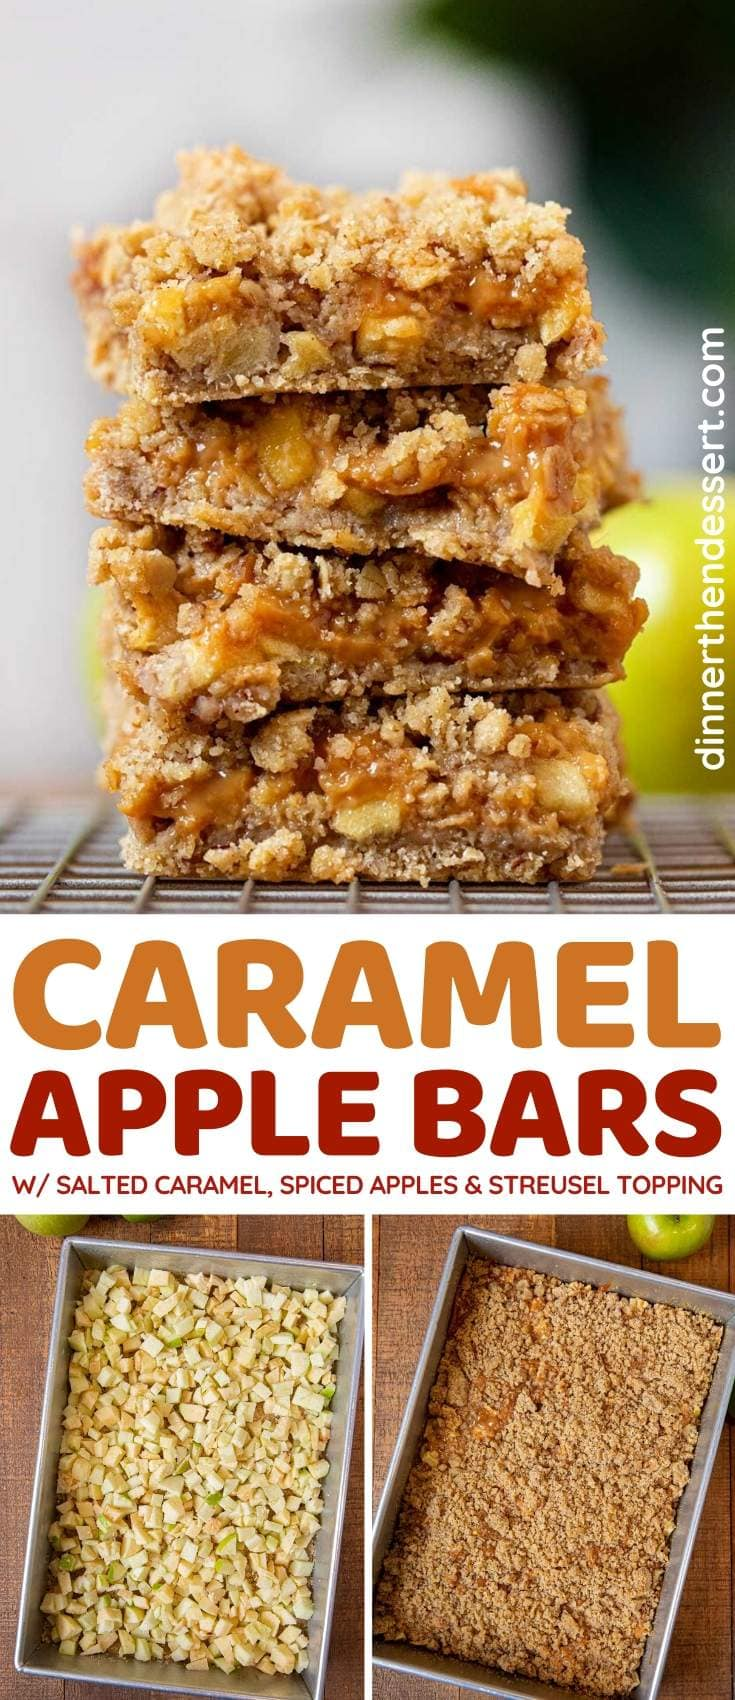 Caramel Apple Bars collage